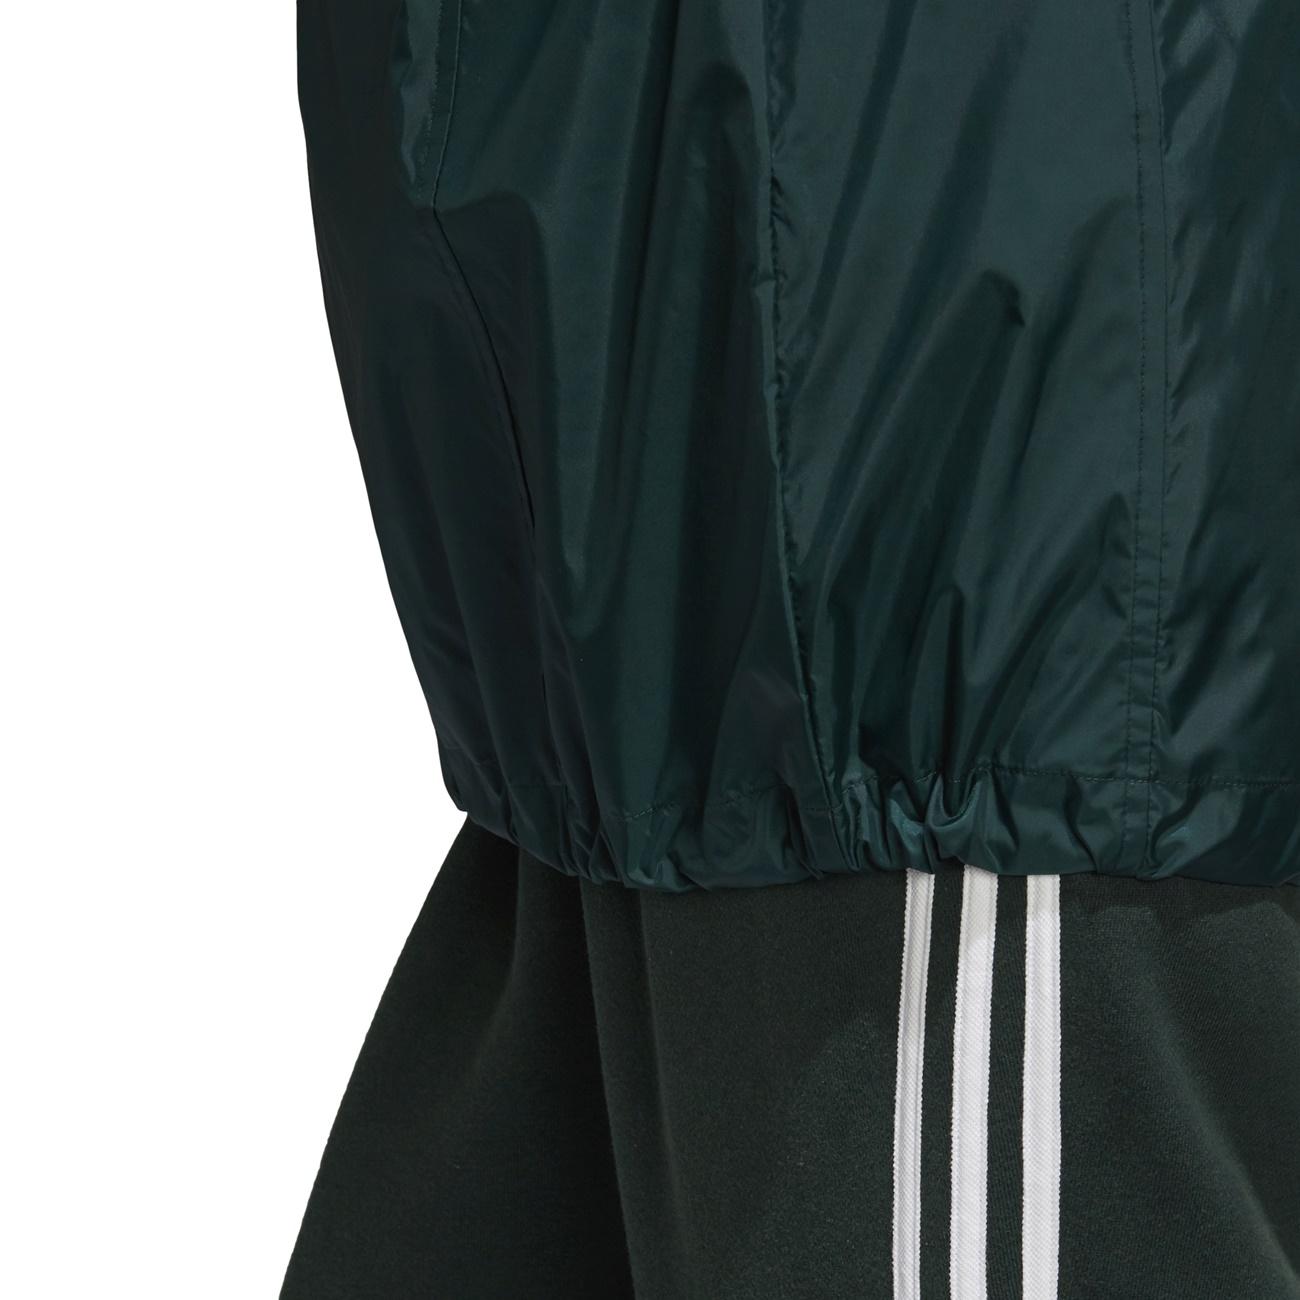 ... Adidas Originals Trefoil Manager Coat Jacket c141963ce85